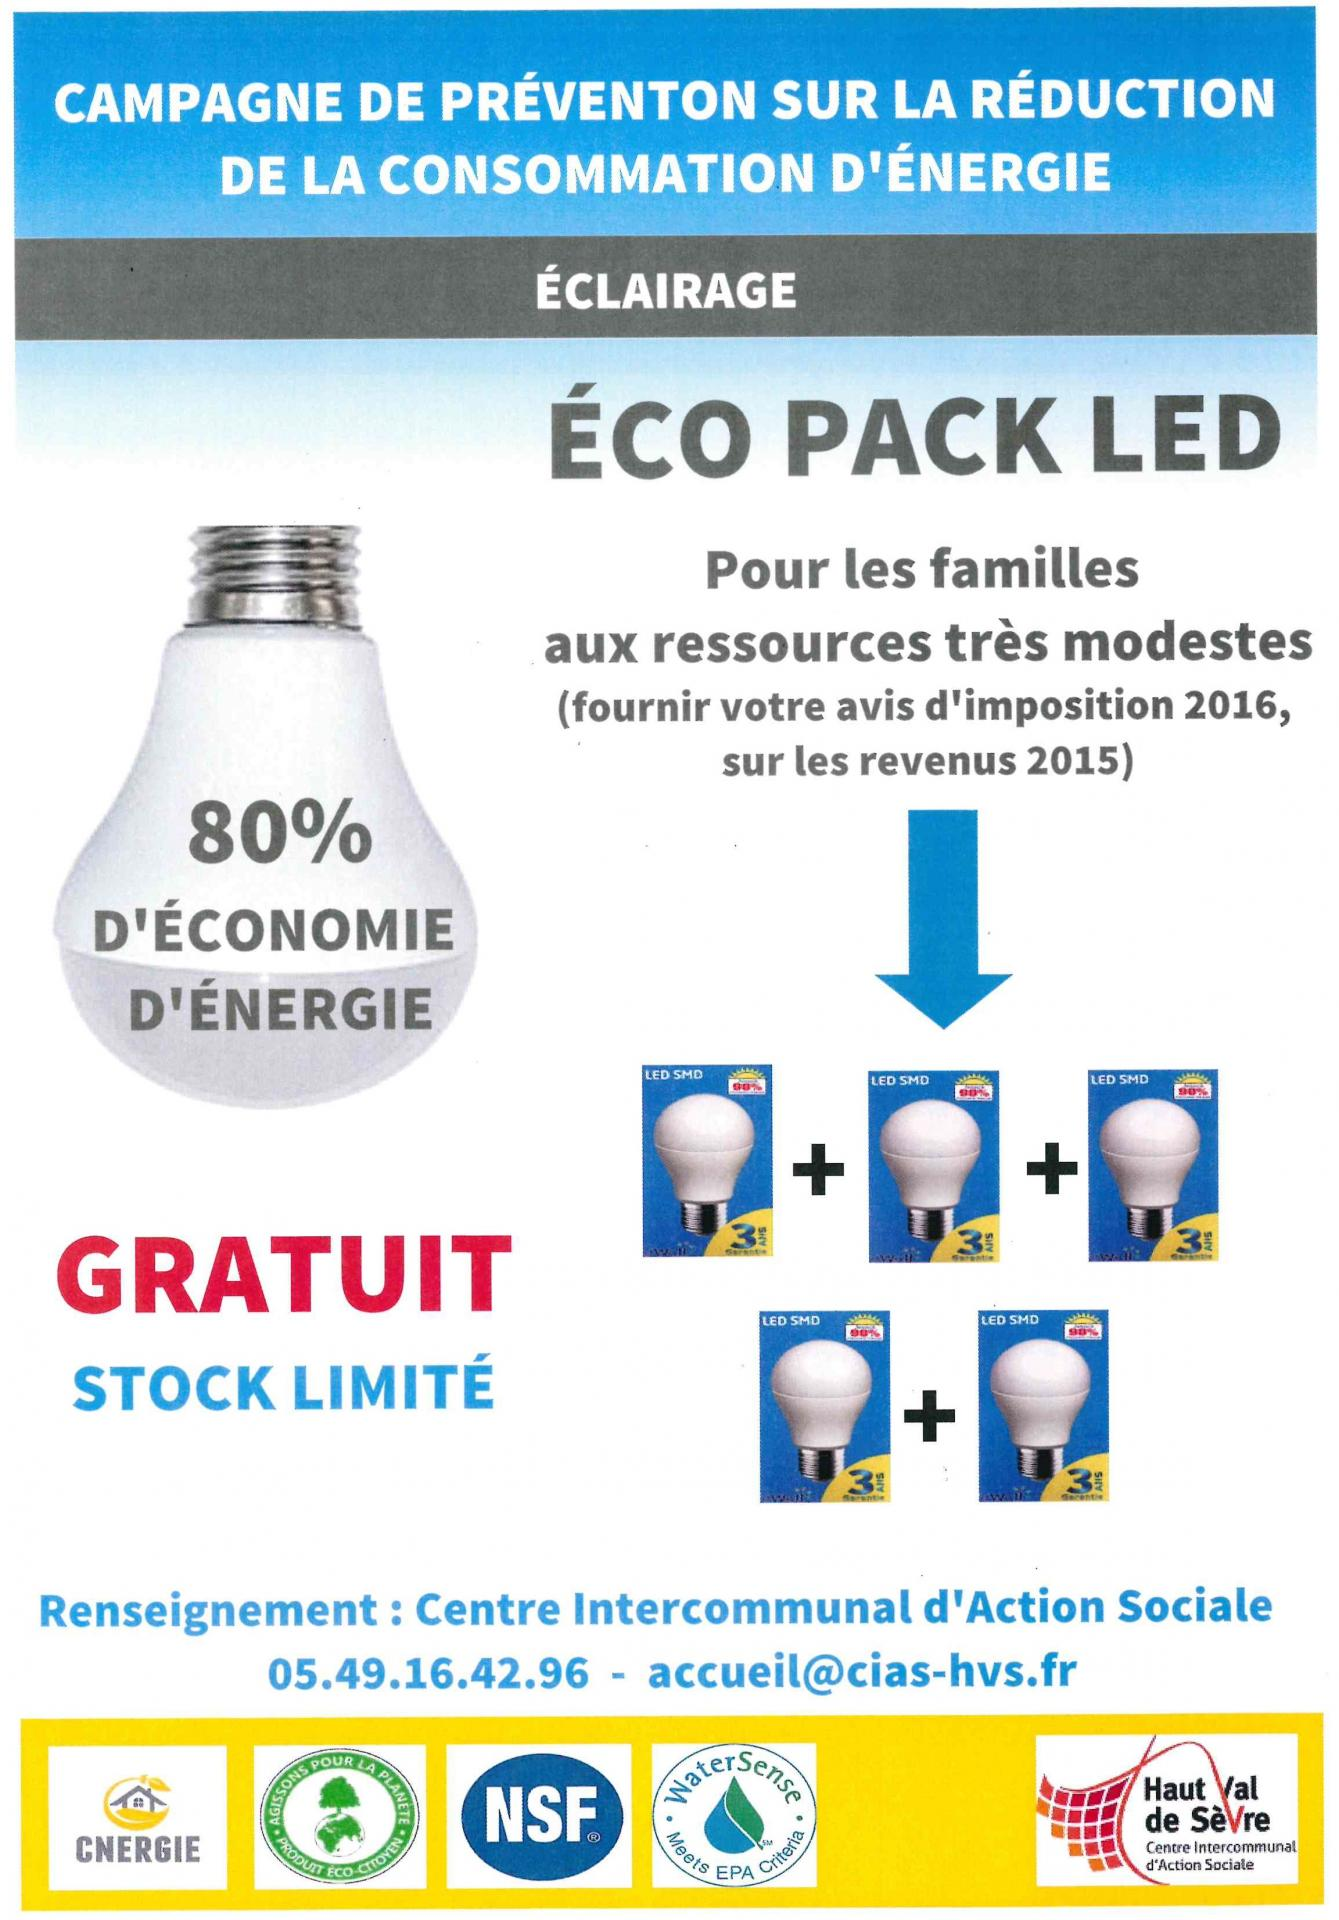 Eco pack led